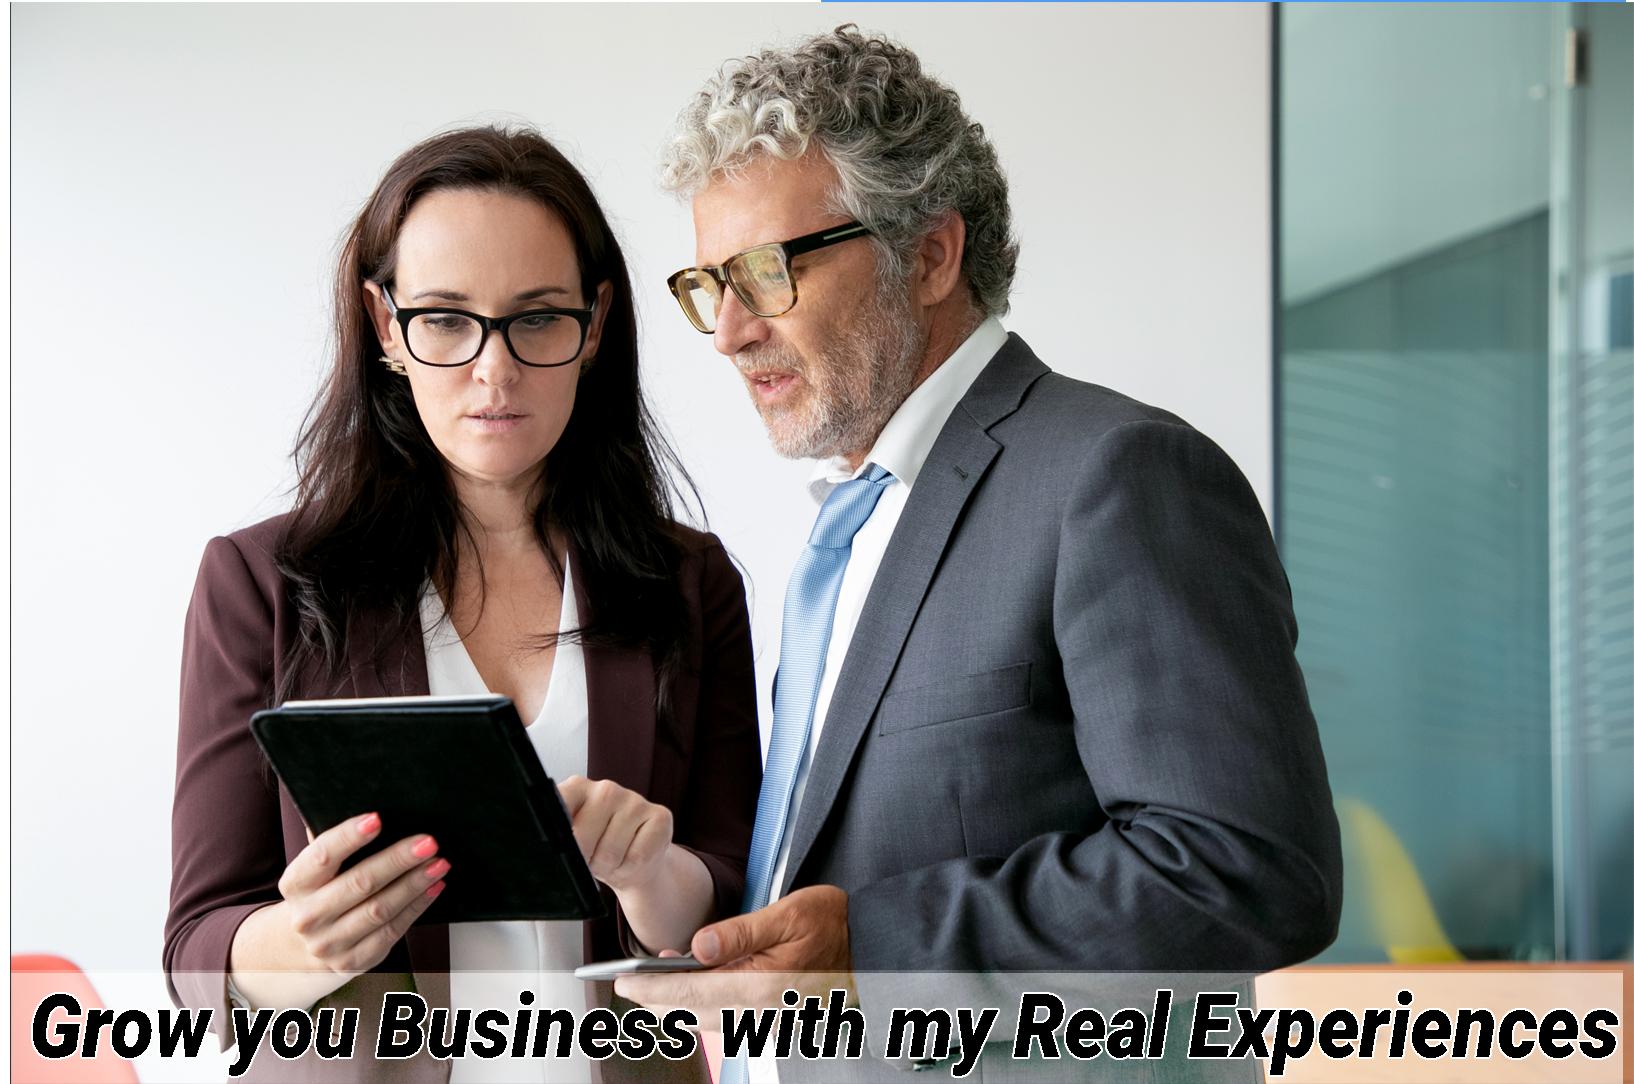 I will help you restaurant business develop unique ideas